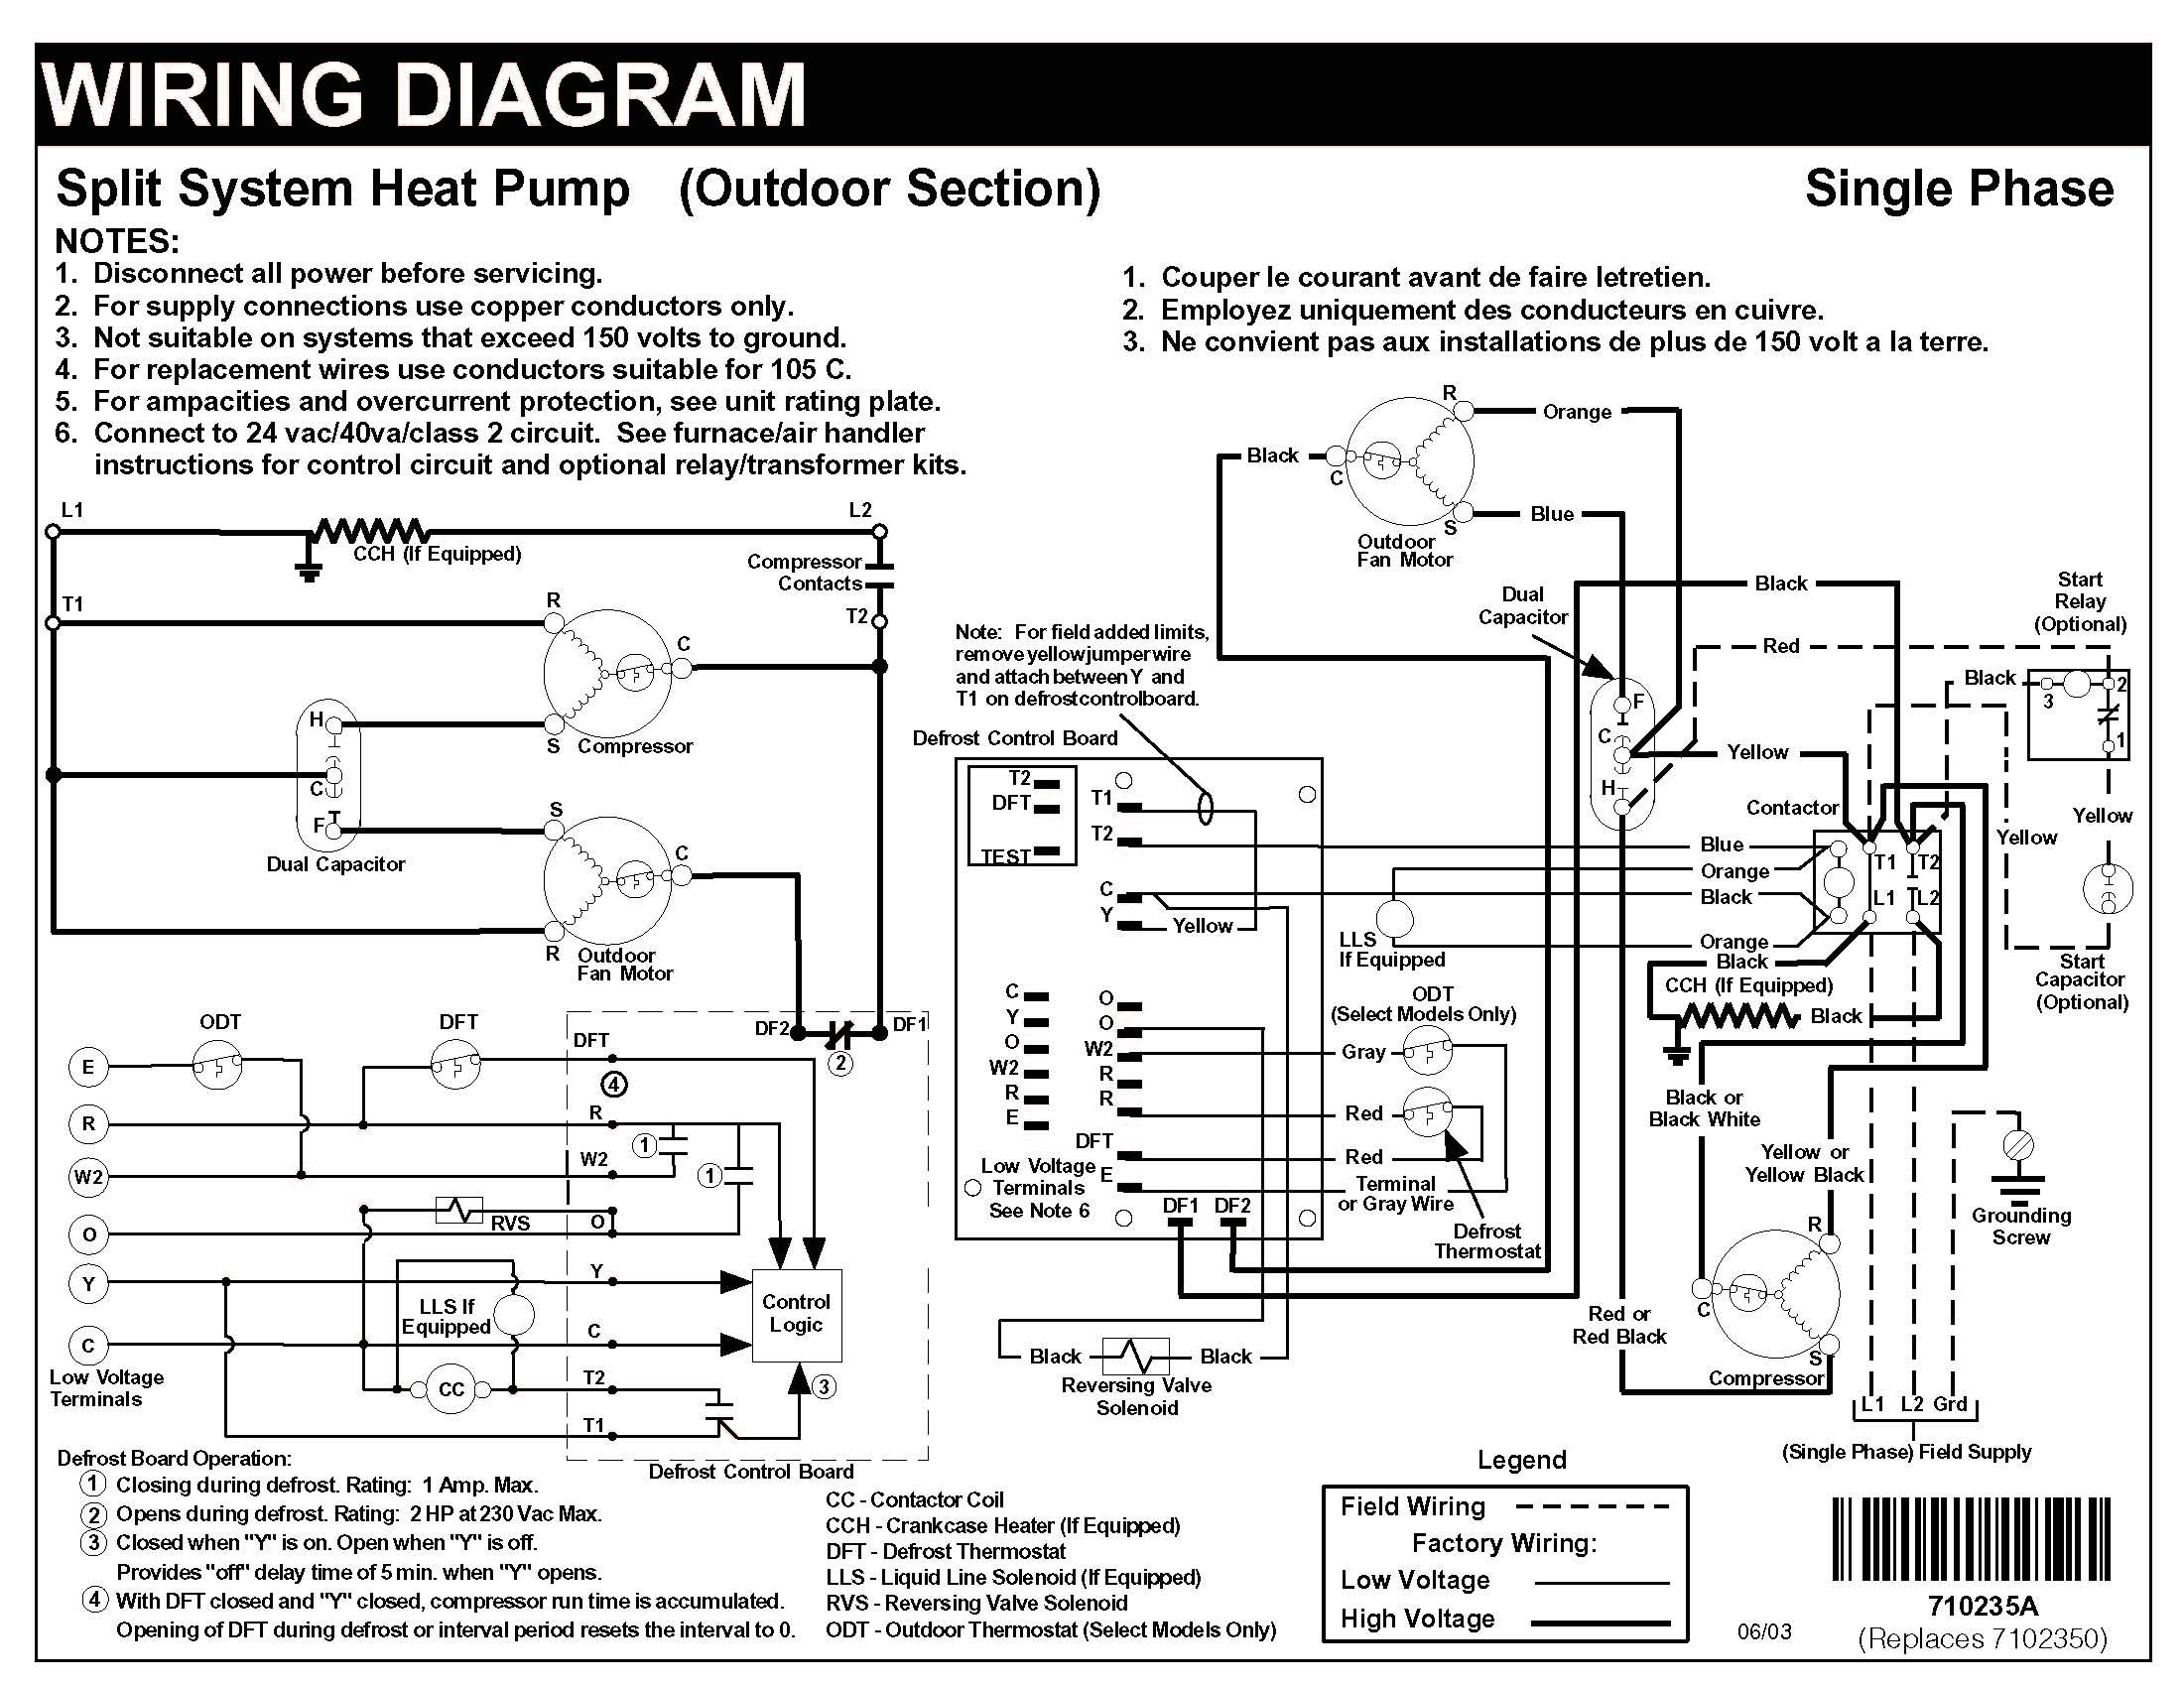 hight resolution of lennox heat pump diagram wiring diagrams scematic lennox cbx diagram heat pumps residential heat pumps heat